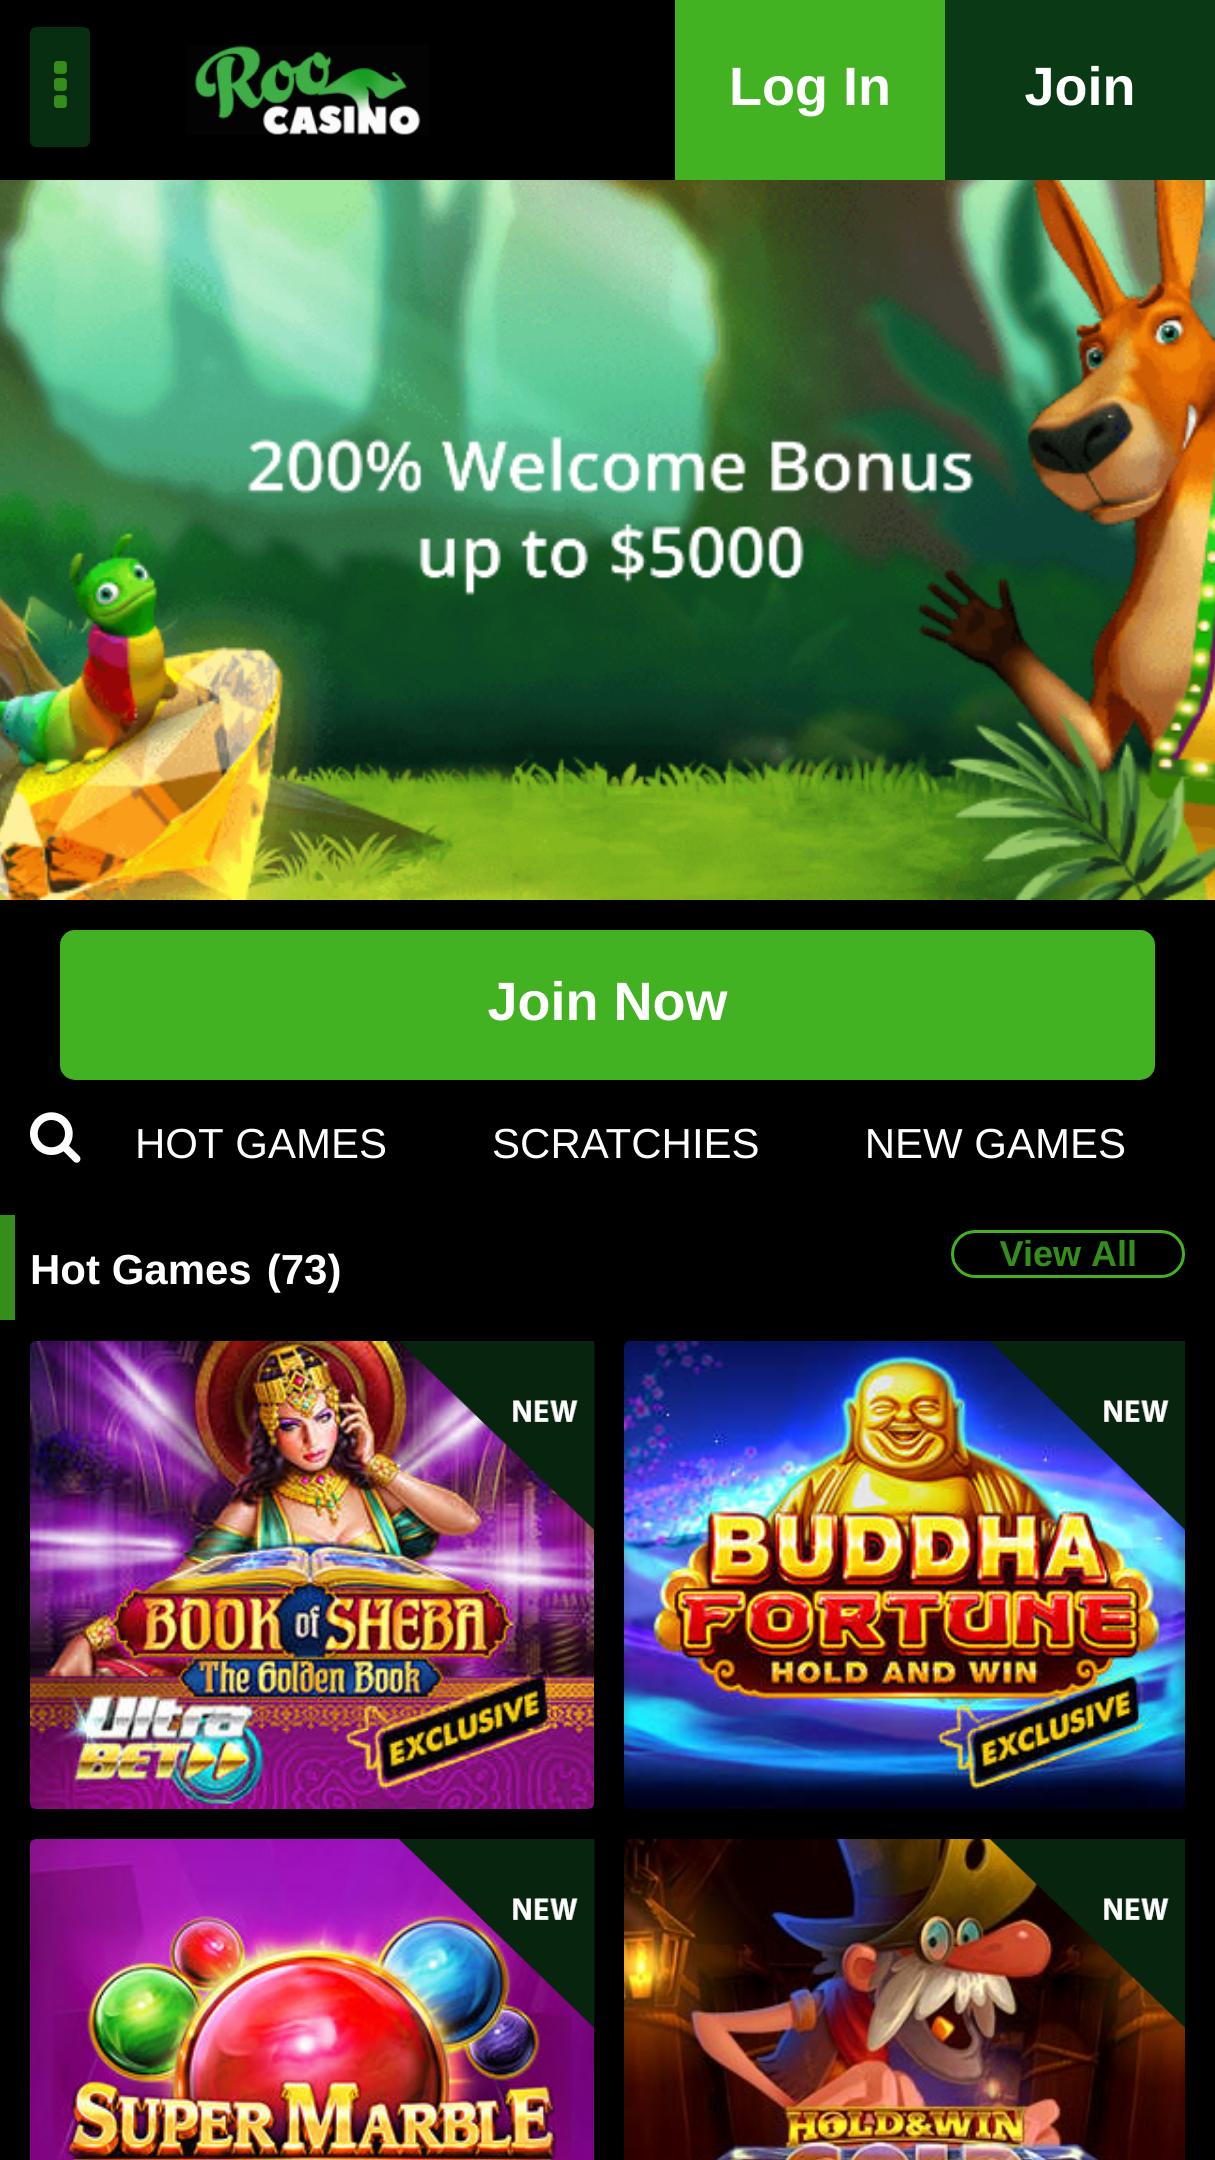 All Star Slots No Deposit Bonus Codes 2021